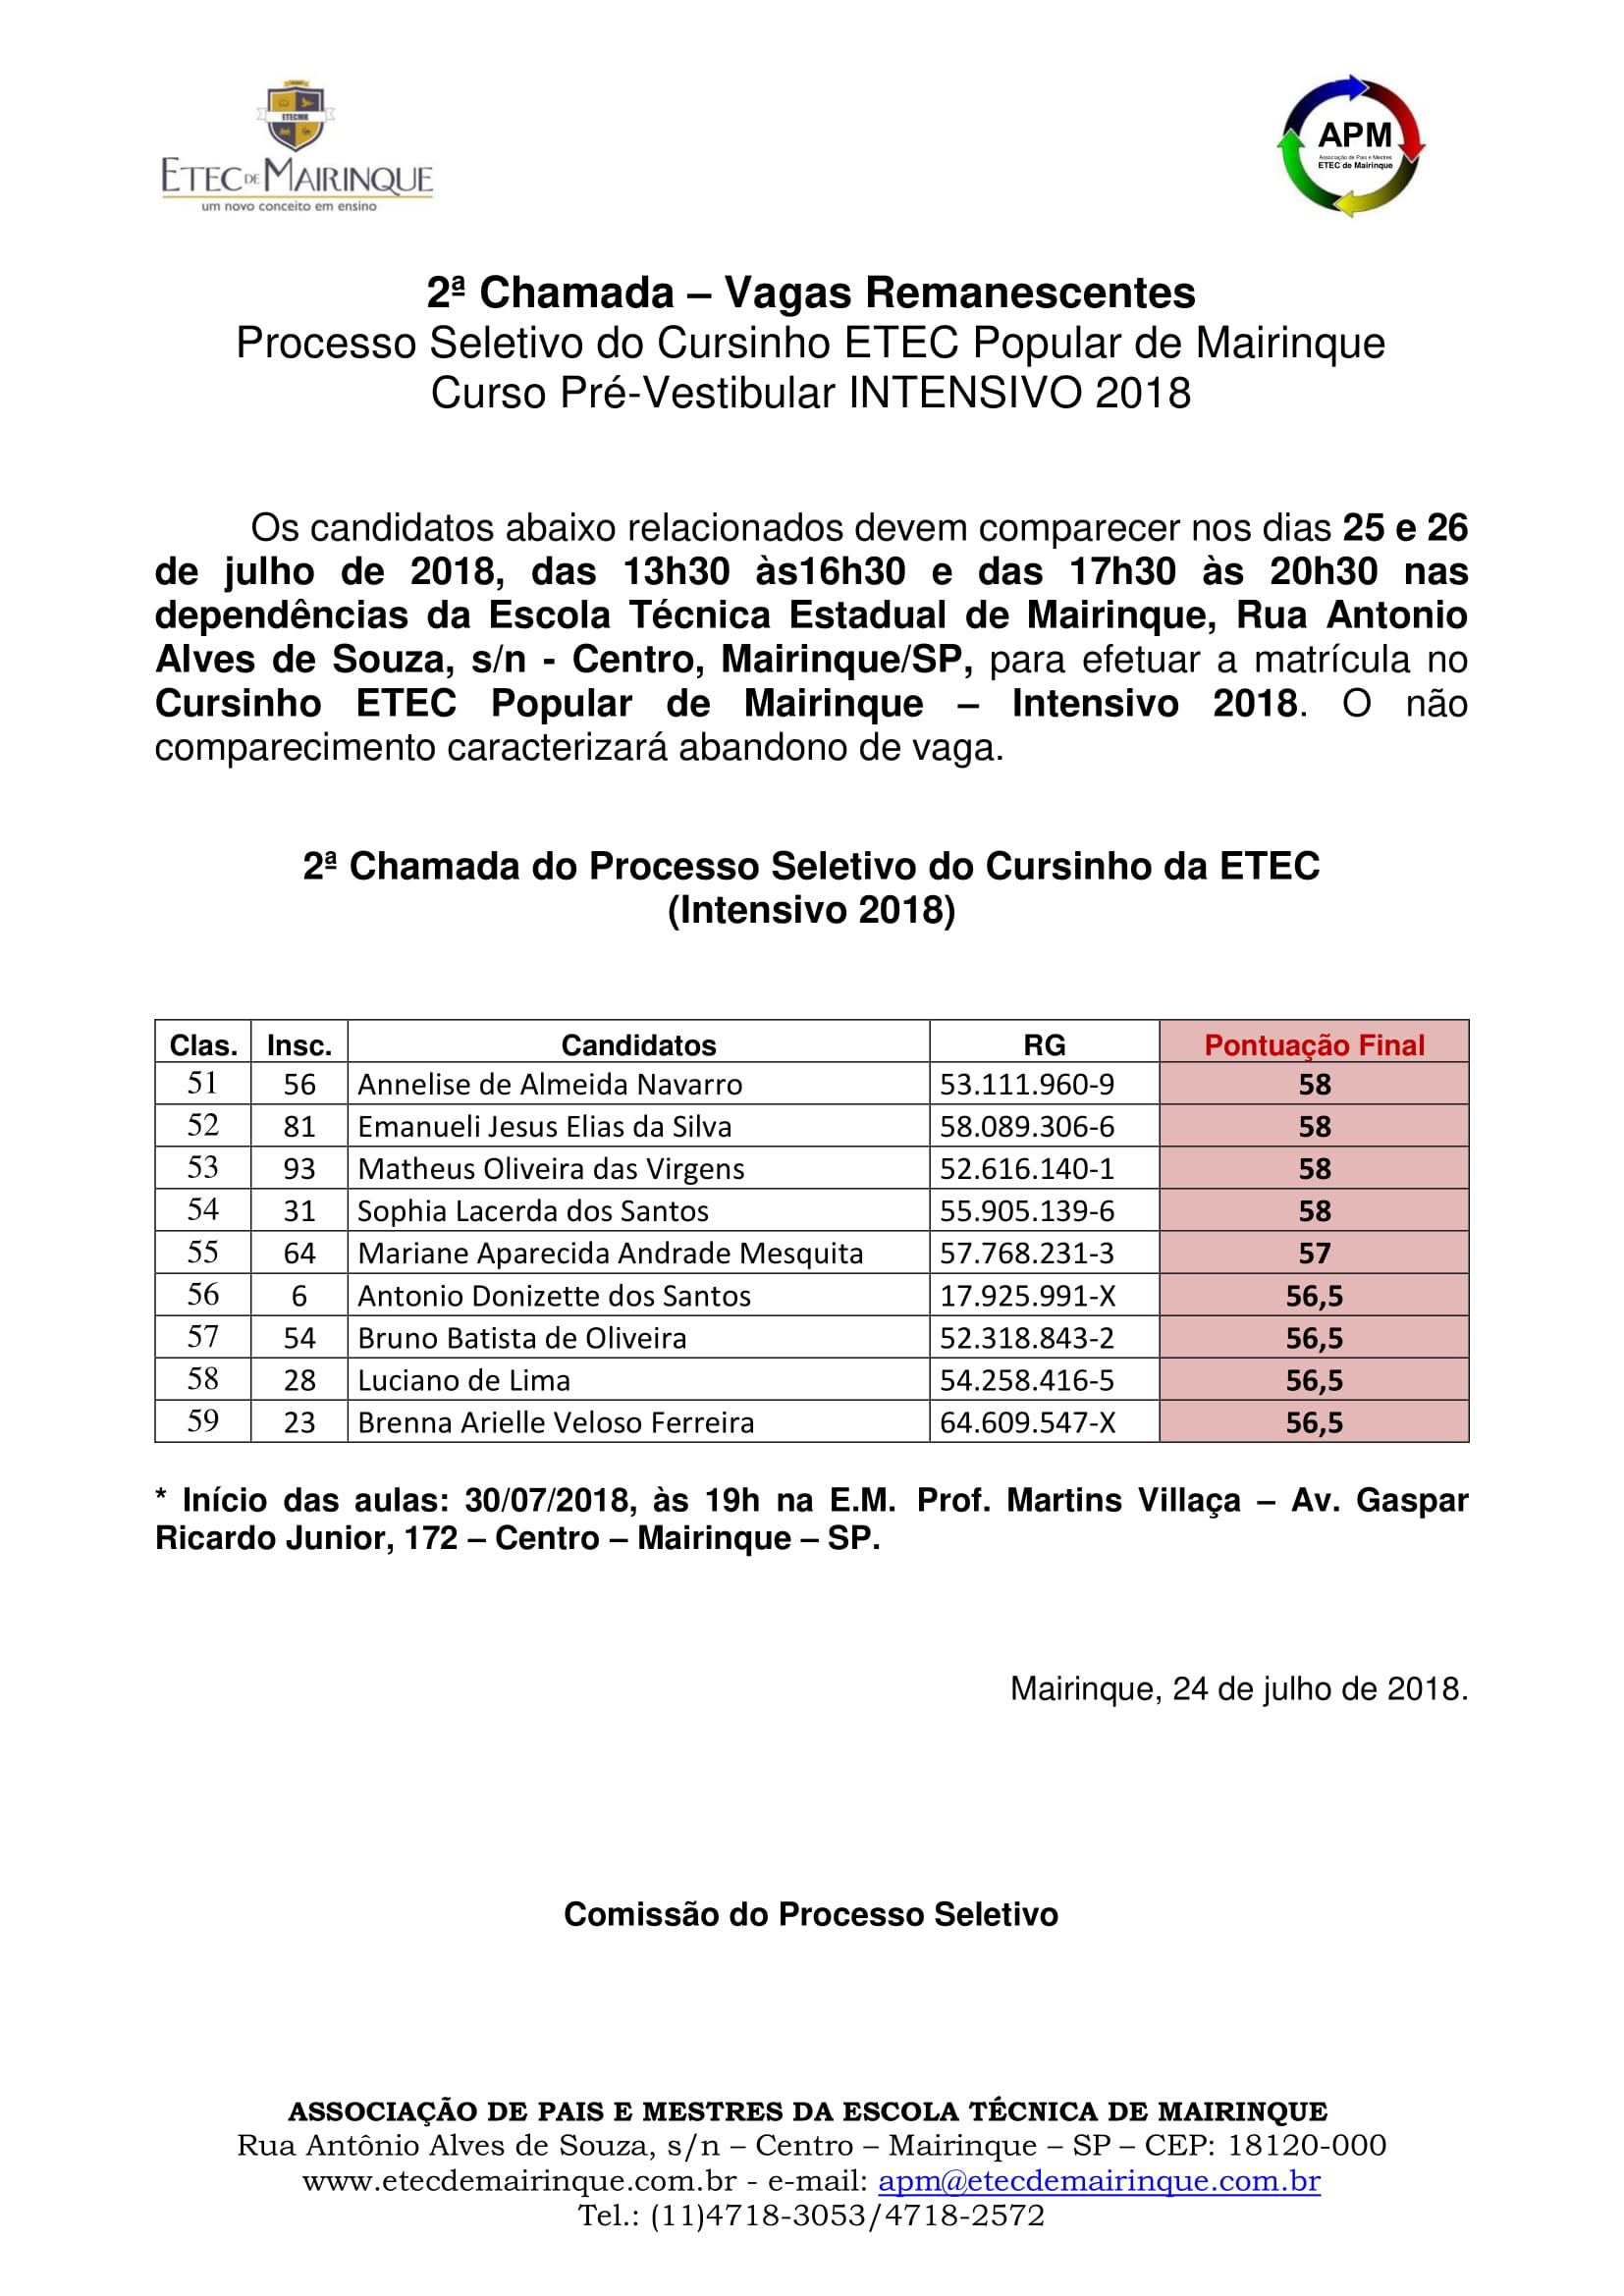 2ª Chamada - INTENSIVO 2018 (002)-1